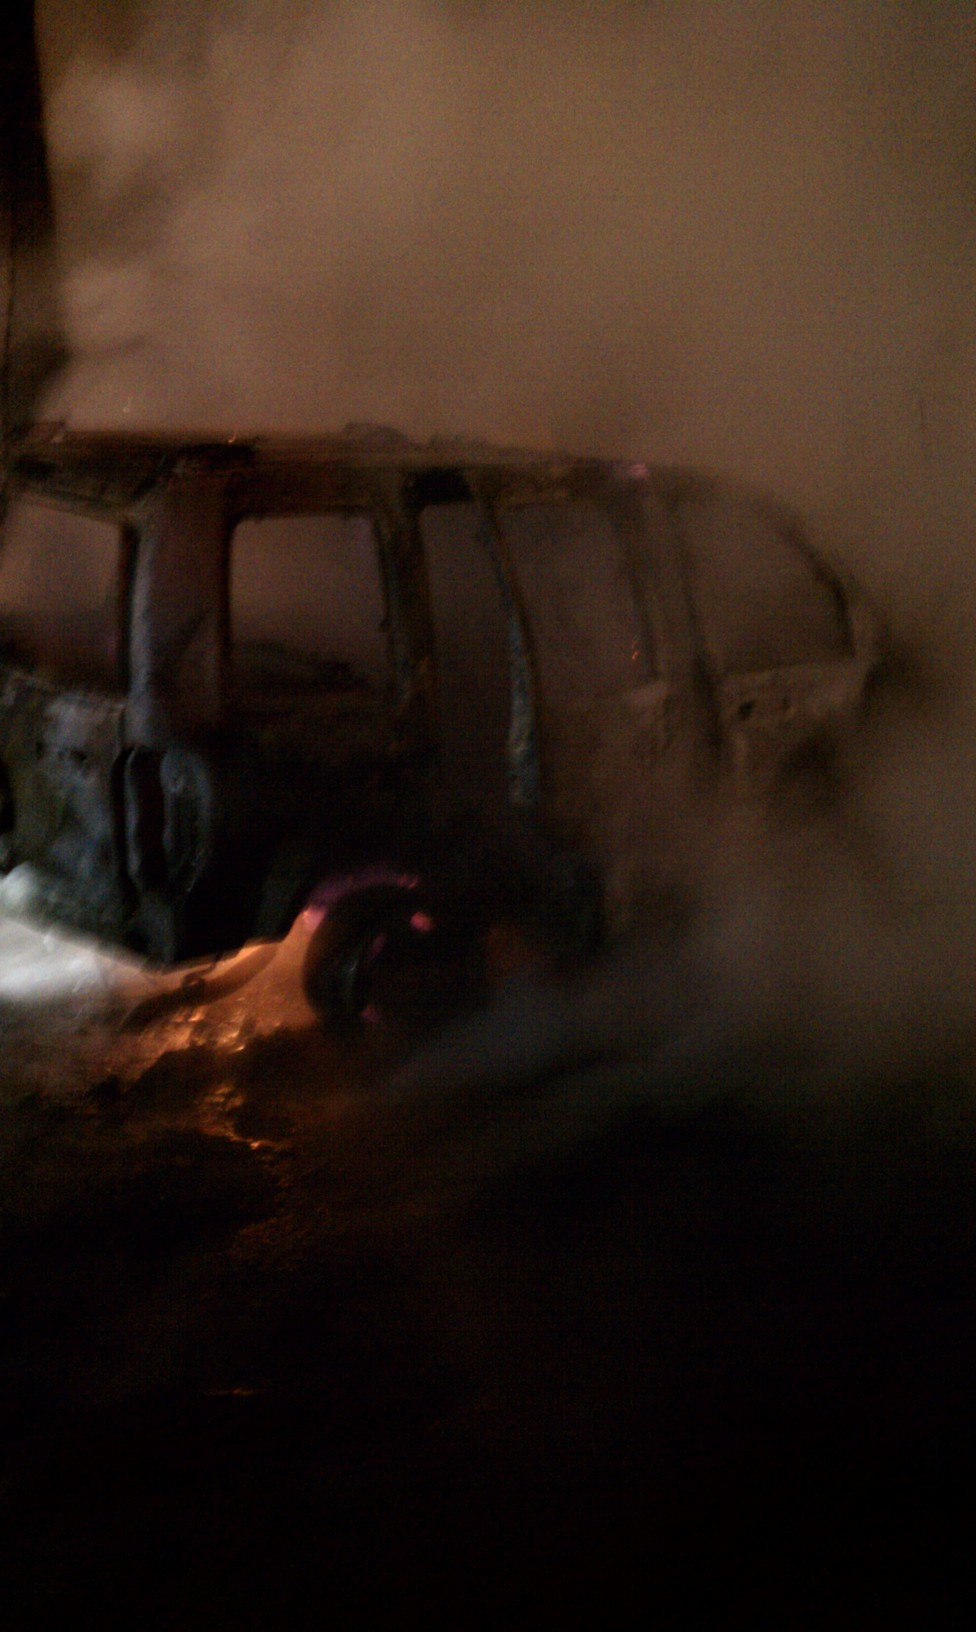 12-19-10 Vehicle Fire on Spruce Street